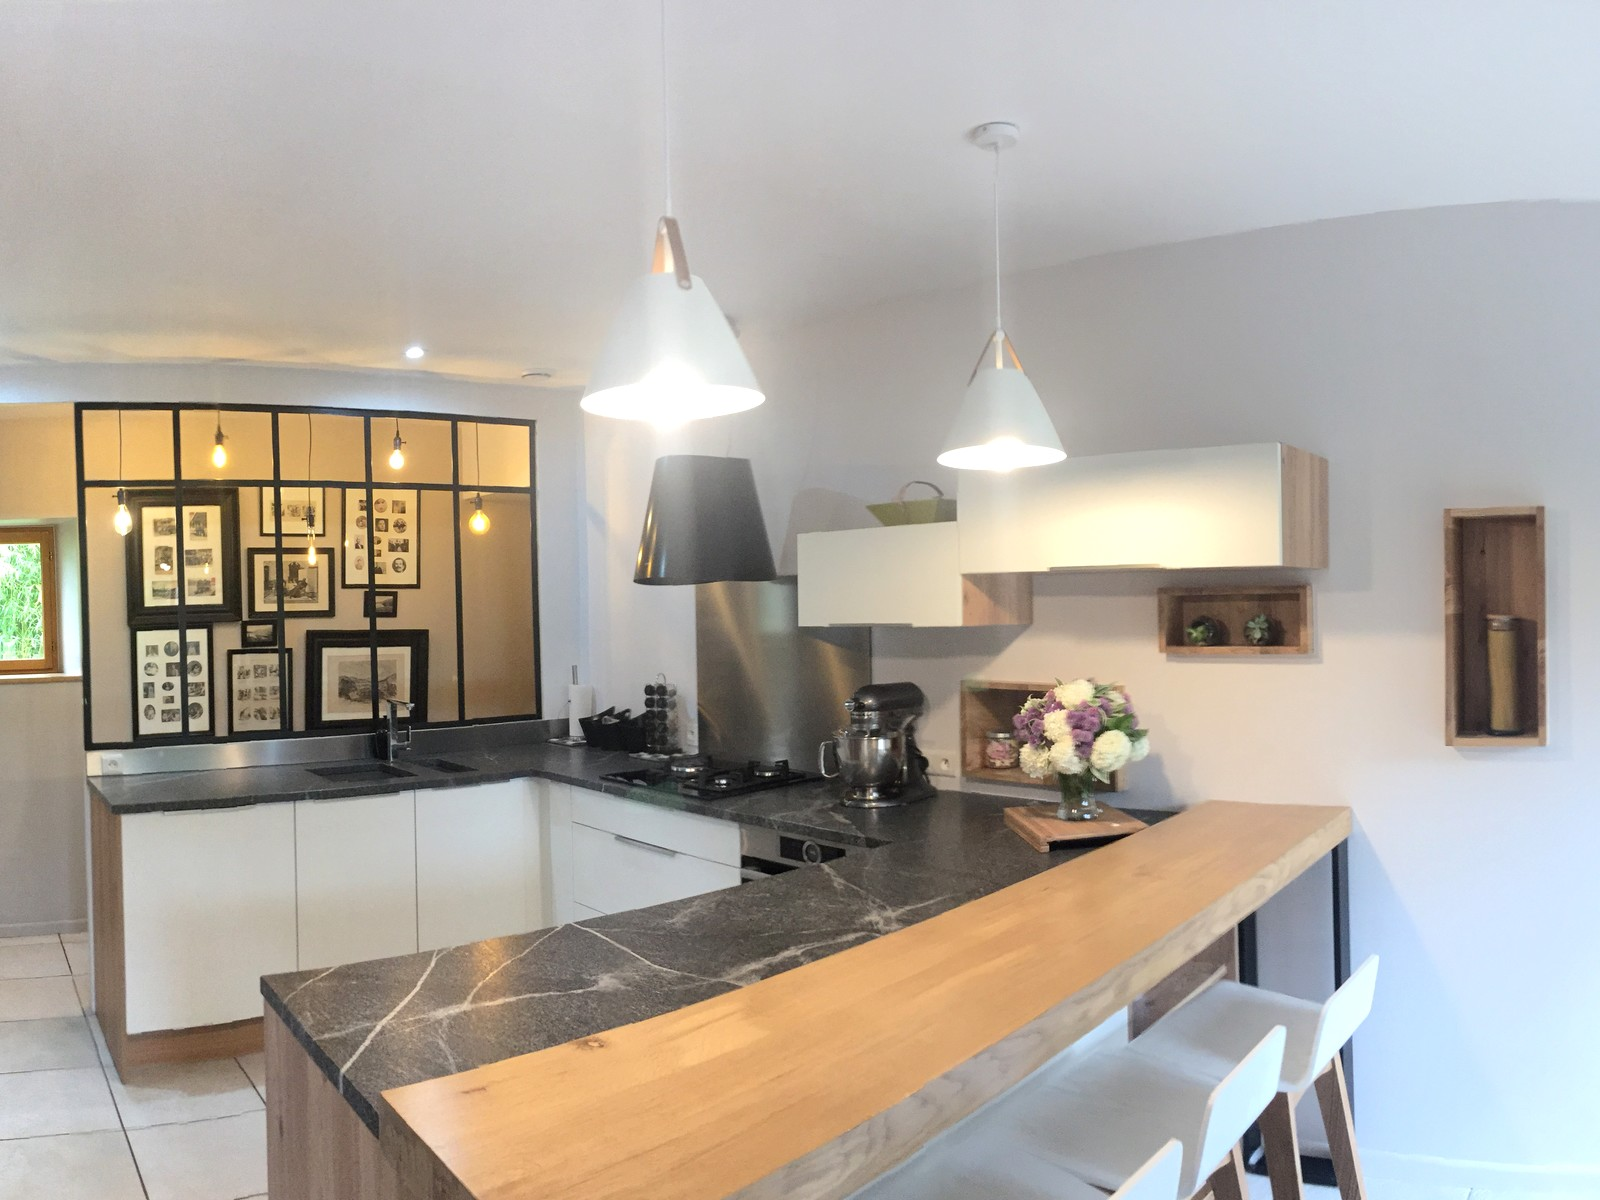 Plan De Cuisine En Marbre granit jurassic grey cuir : effet marbre cuisine ambiance